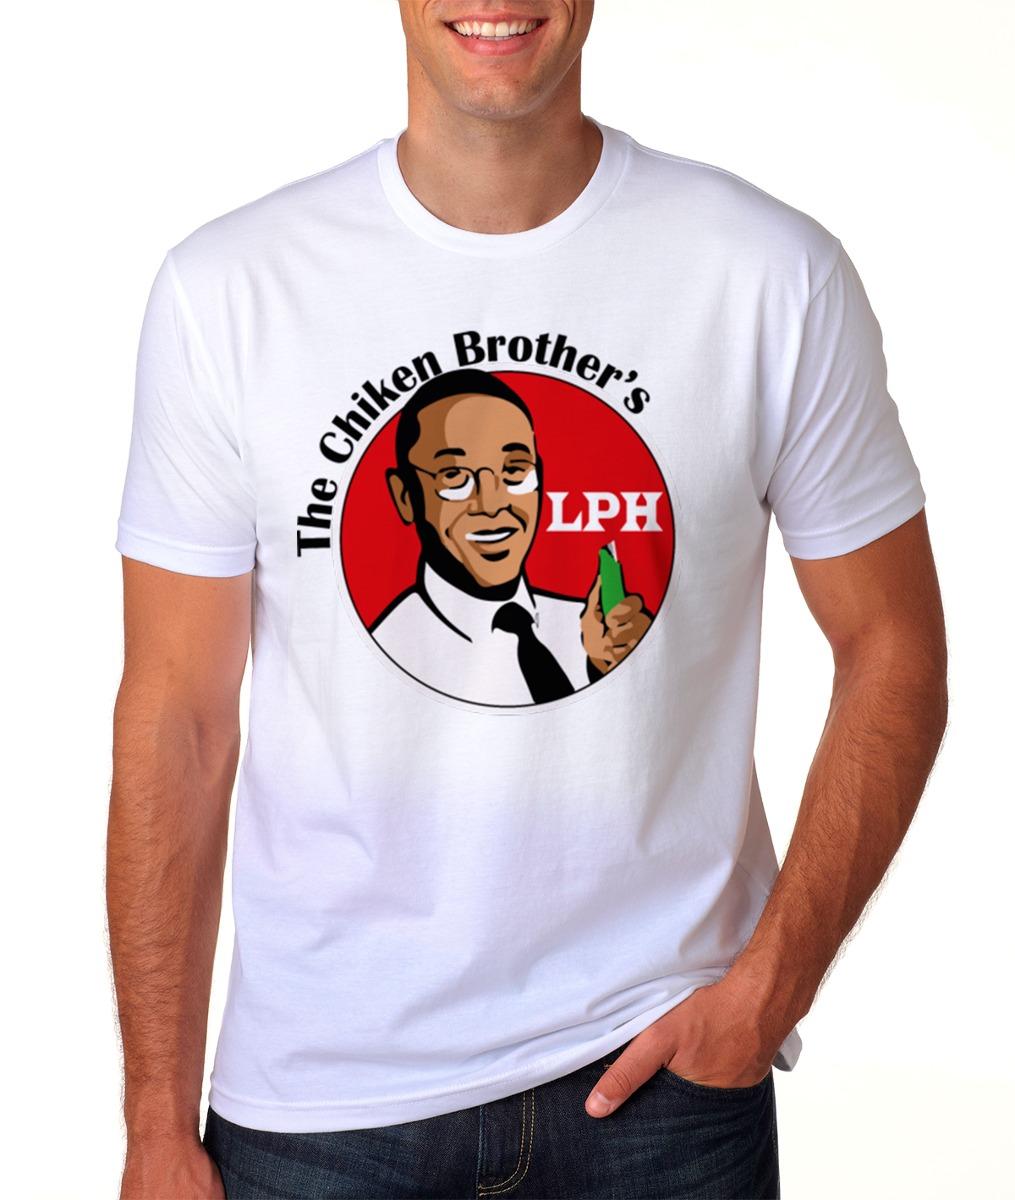 1f4b1ddabd camiseta branca breaking bad los pollos hermanos gus fring 3. Carregando  zoom.